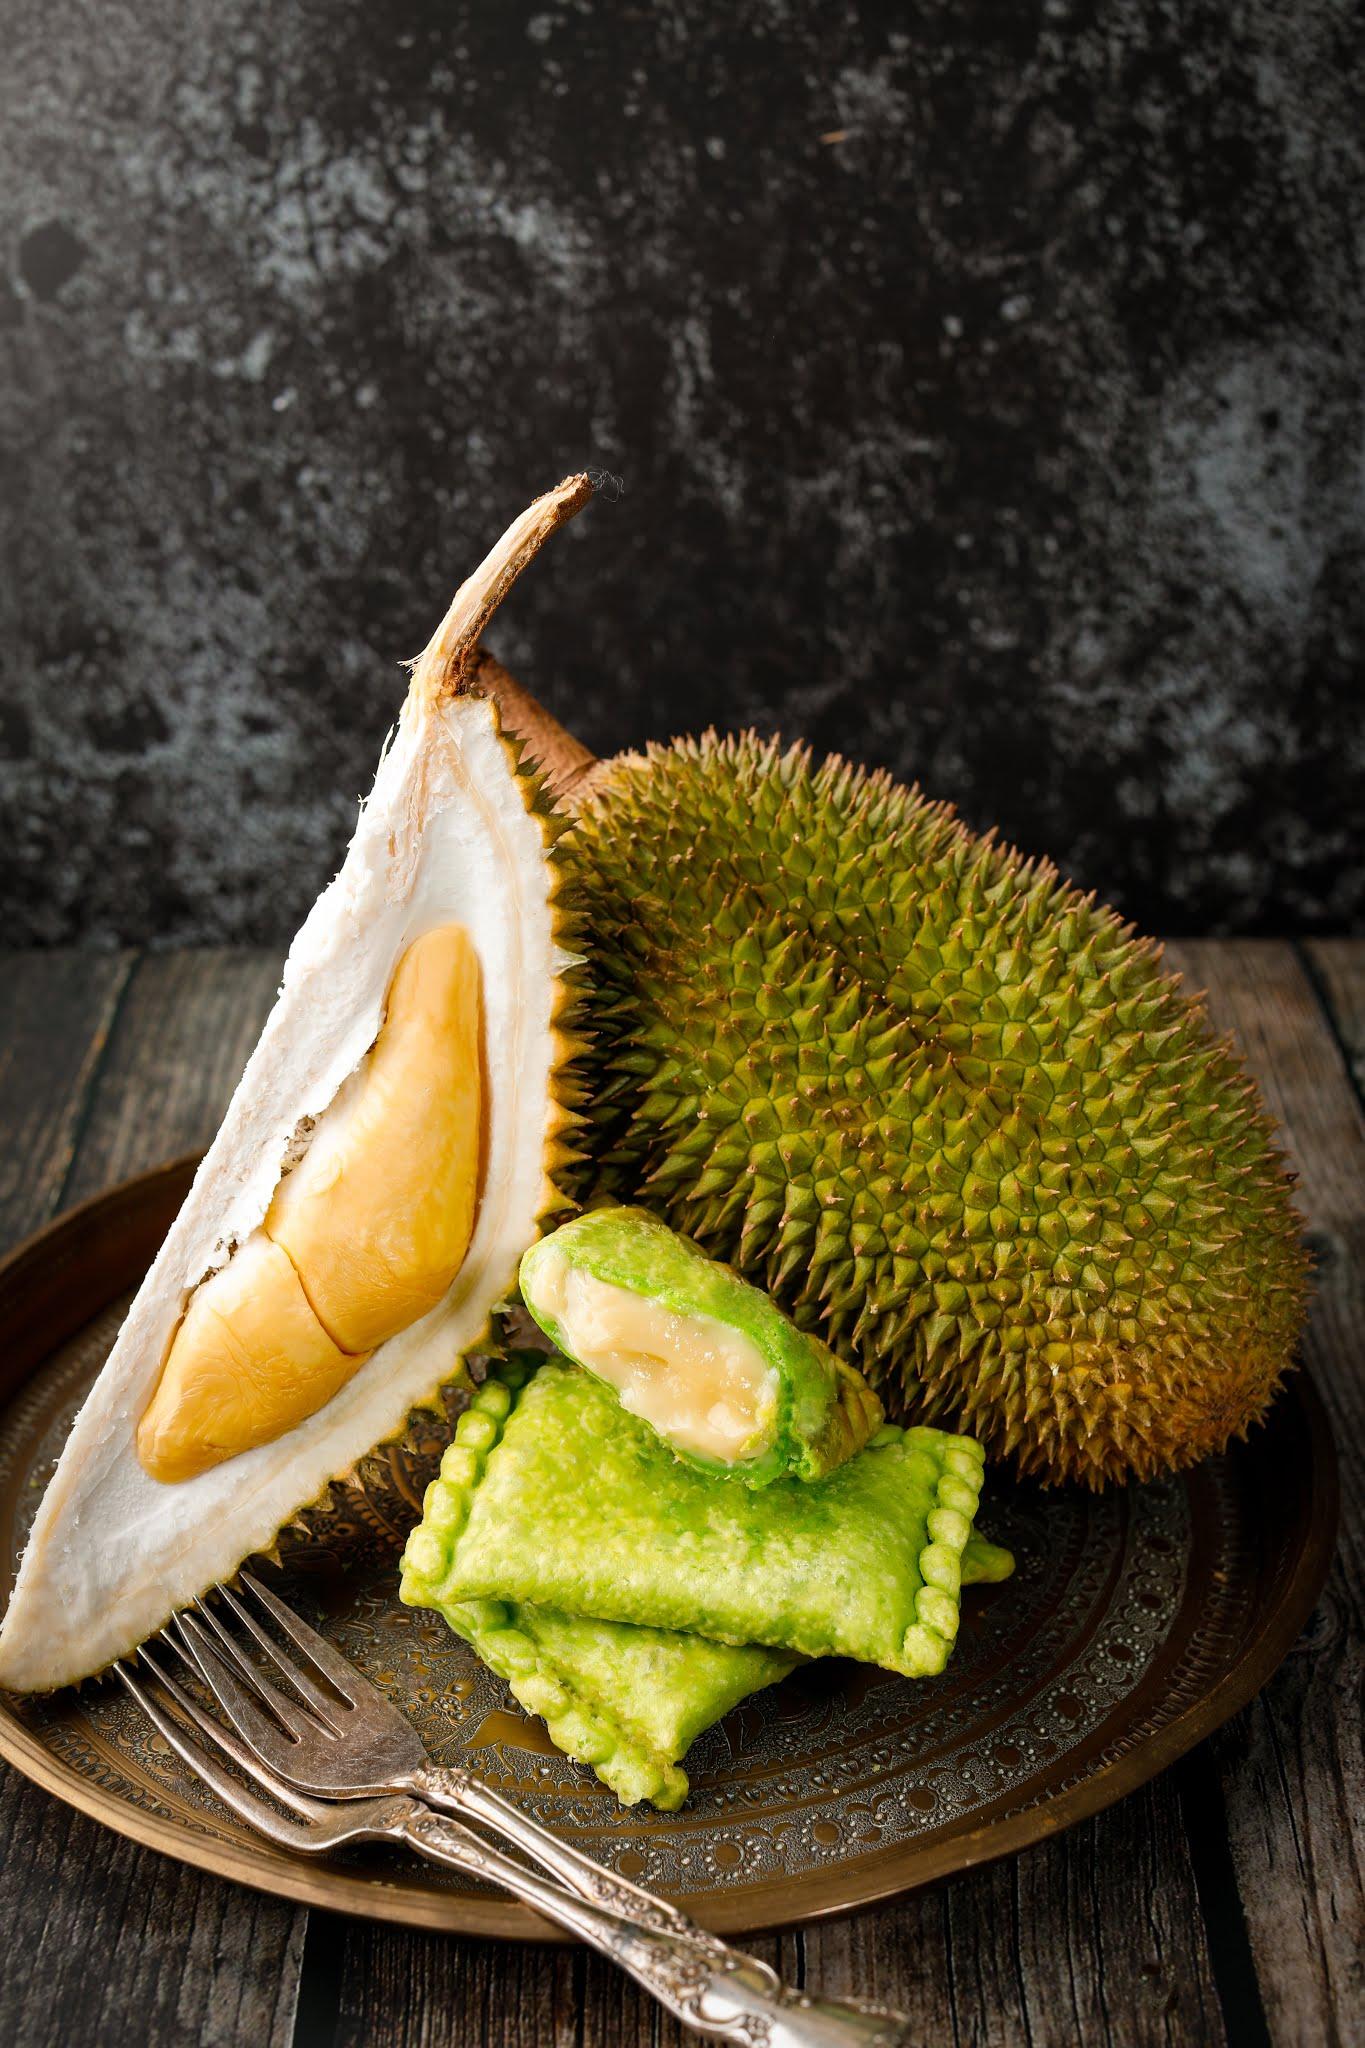 Old Chang Kee Launches Mao Shan Wang Durian Puff